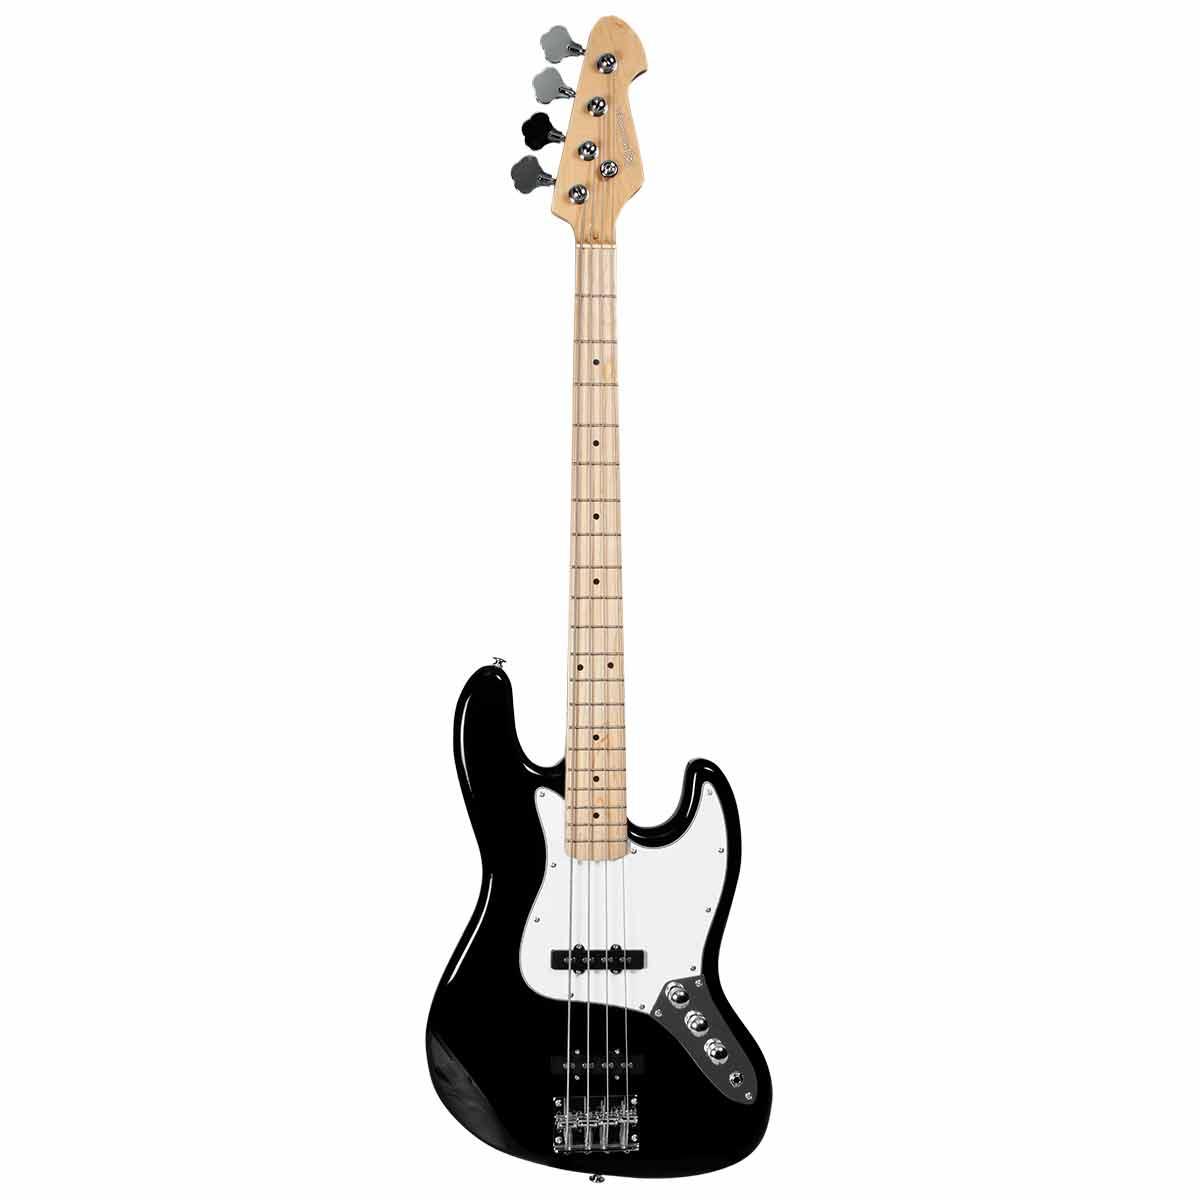 Contrabaixo 4 Cordas Passivo Jazz Bass BM607 BK Preto - Michael